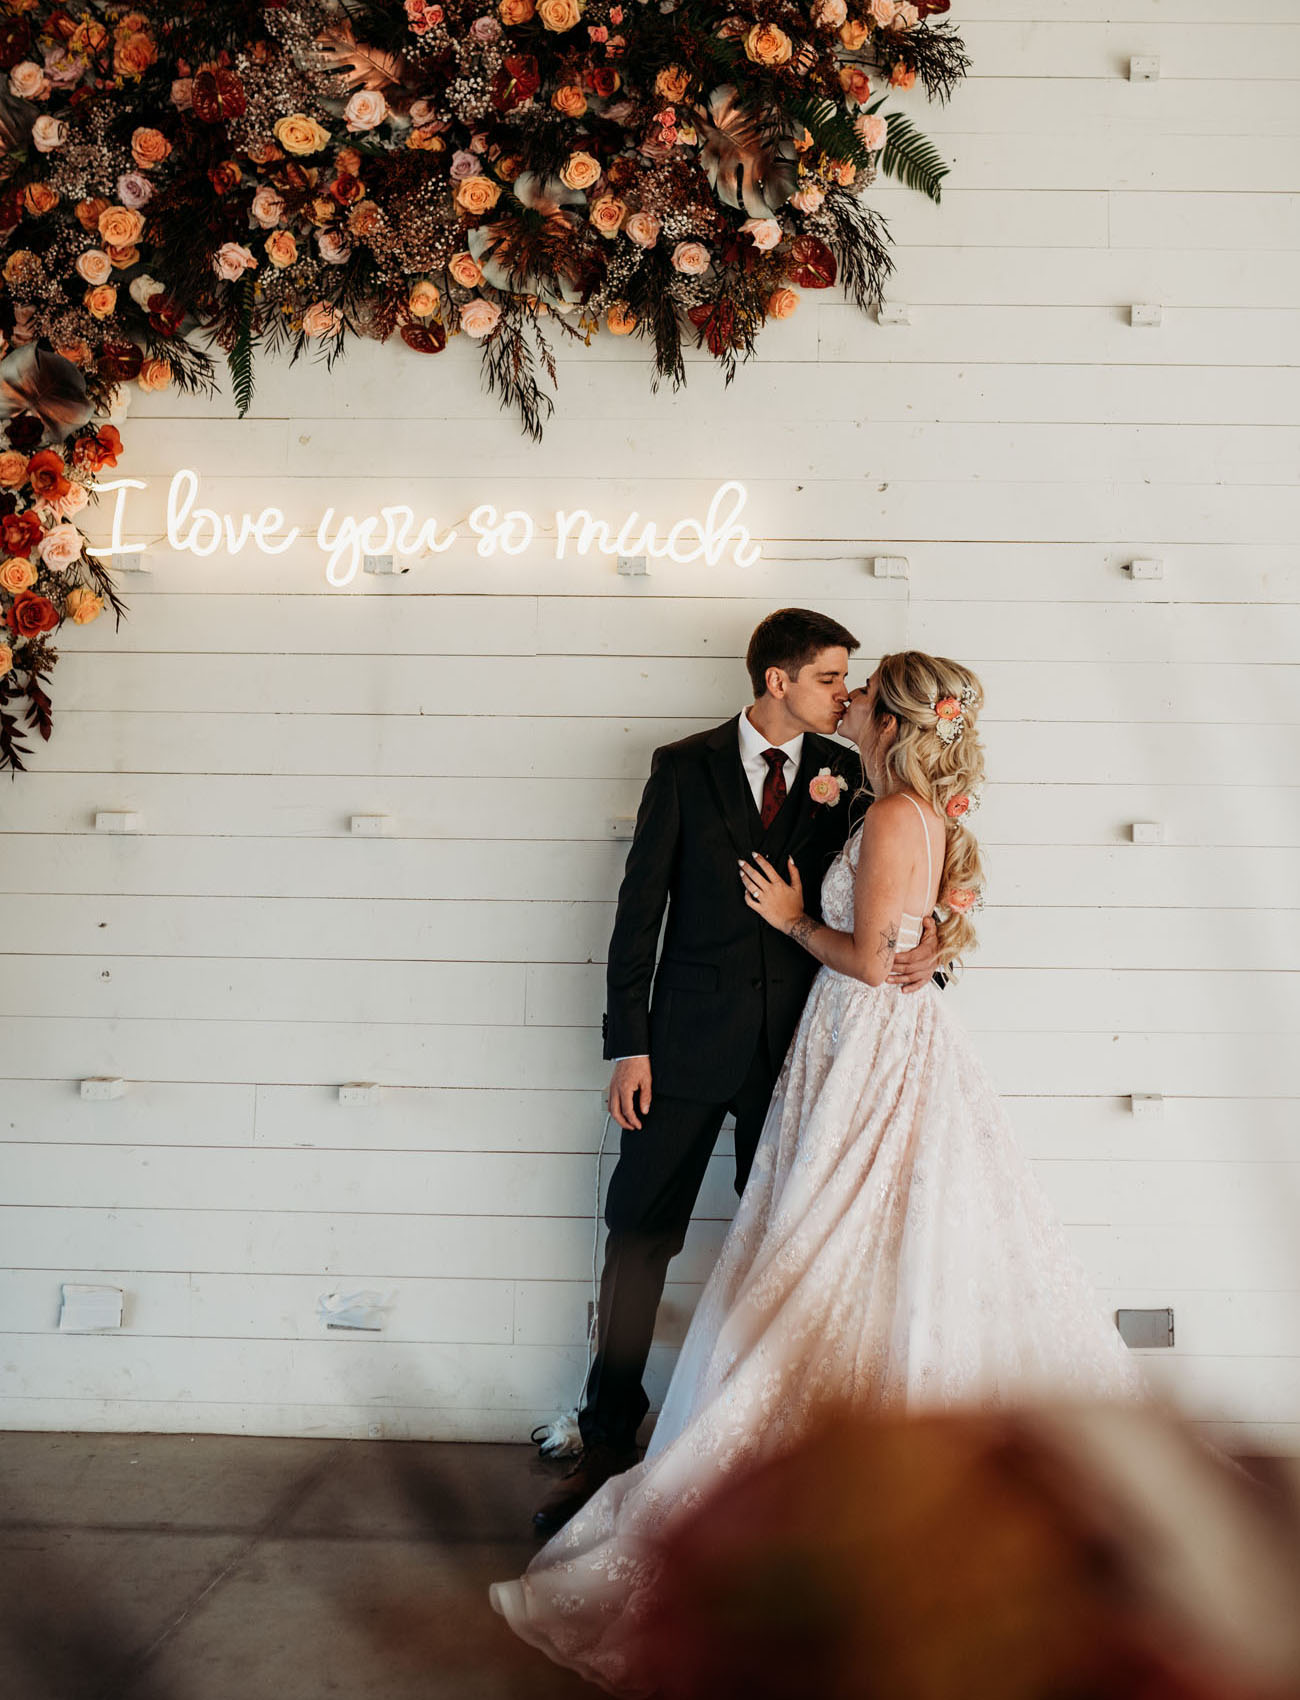 neon wedding signage